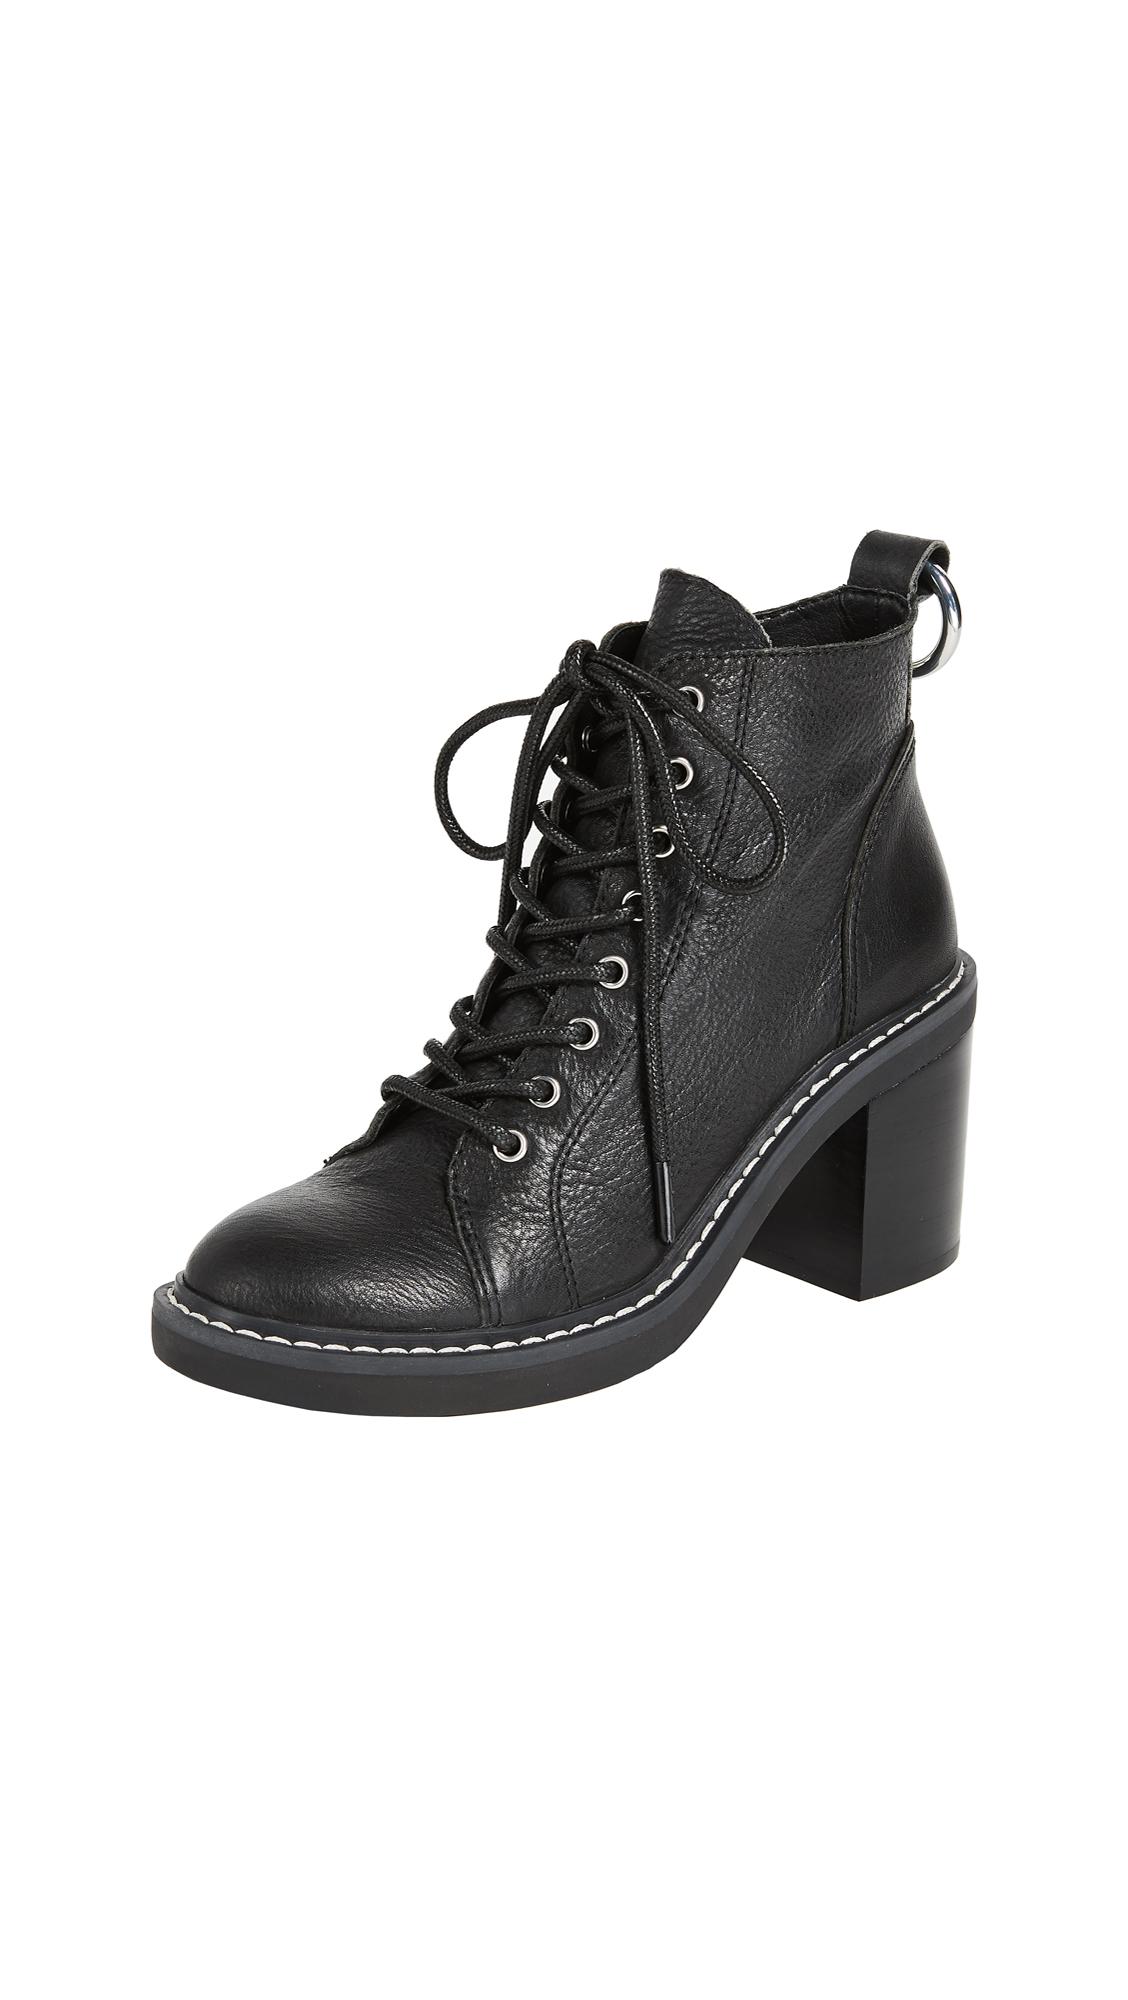 Dolce Vita Lynx Combat Heeled Boots - Black